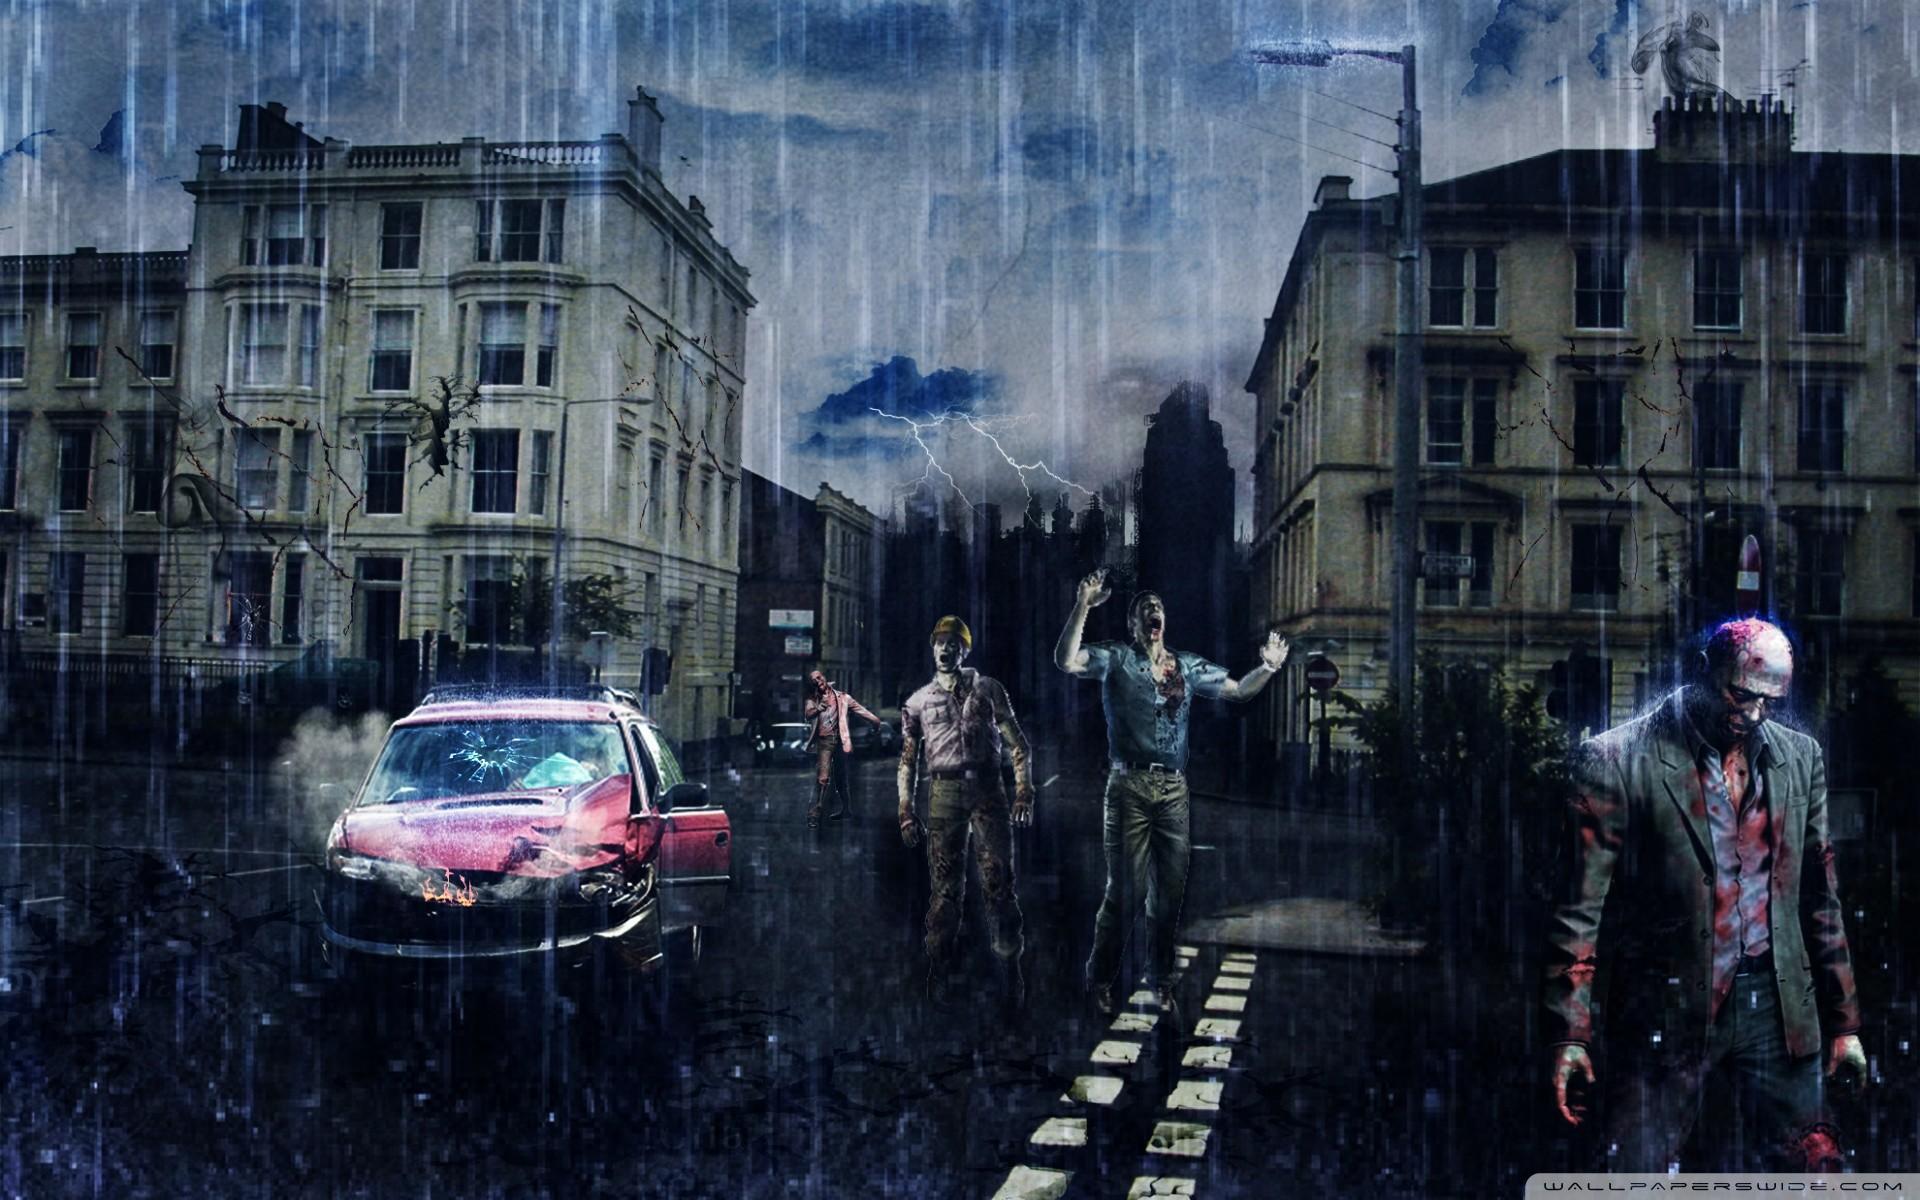 Falling Skies Wallpaper Hd Zombie Apocalypse Wallpaper Hd 76 Images